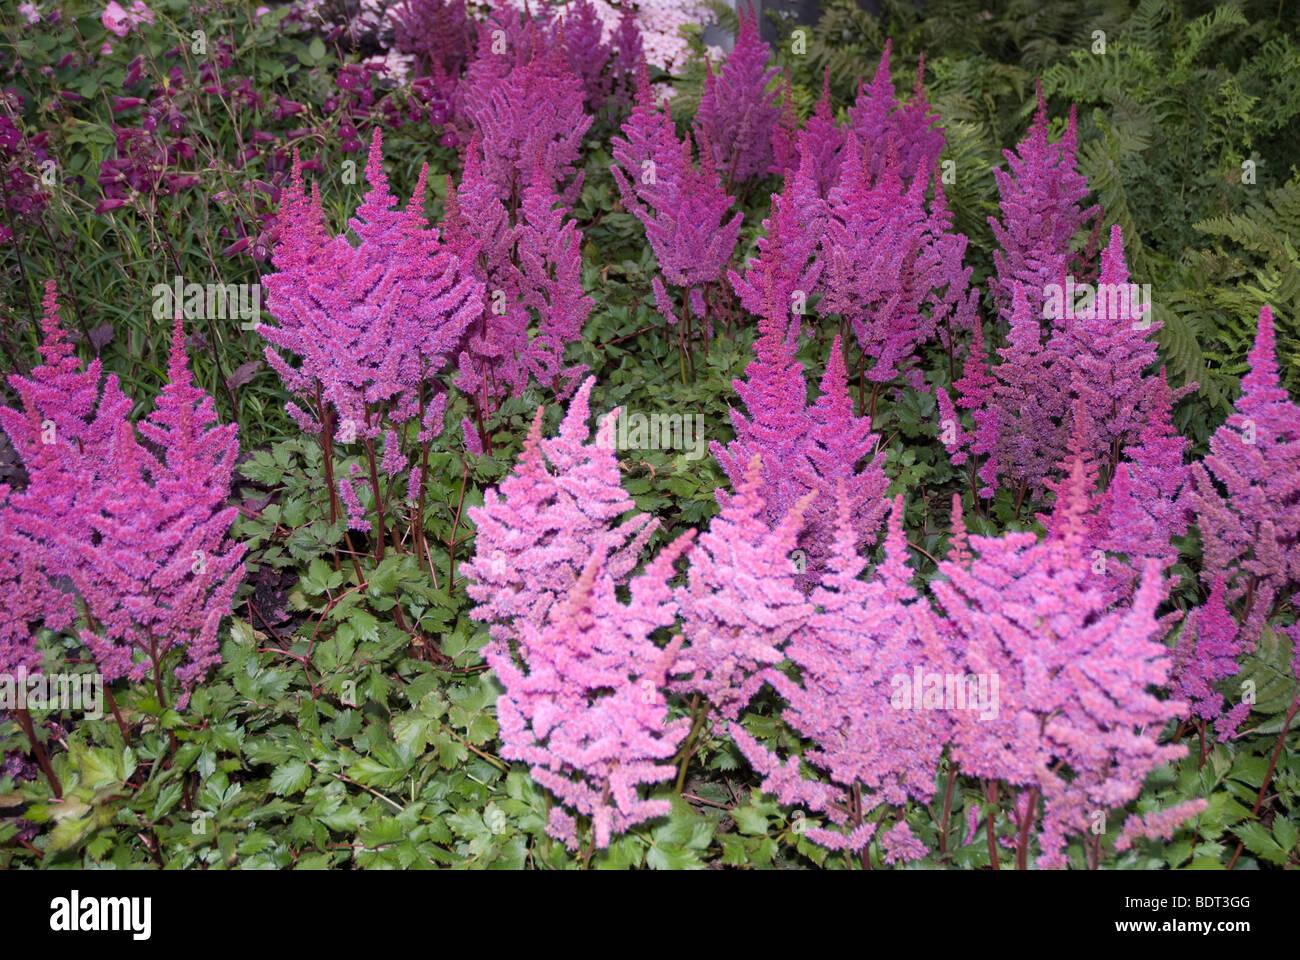 astilbe rose fleurs banque d'images, photo stock: 25730560 - alamy